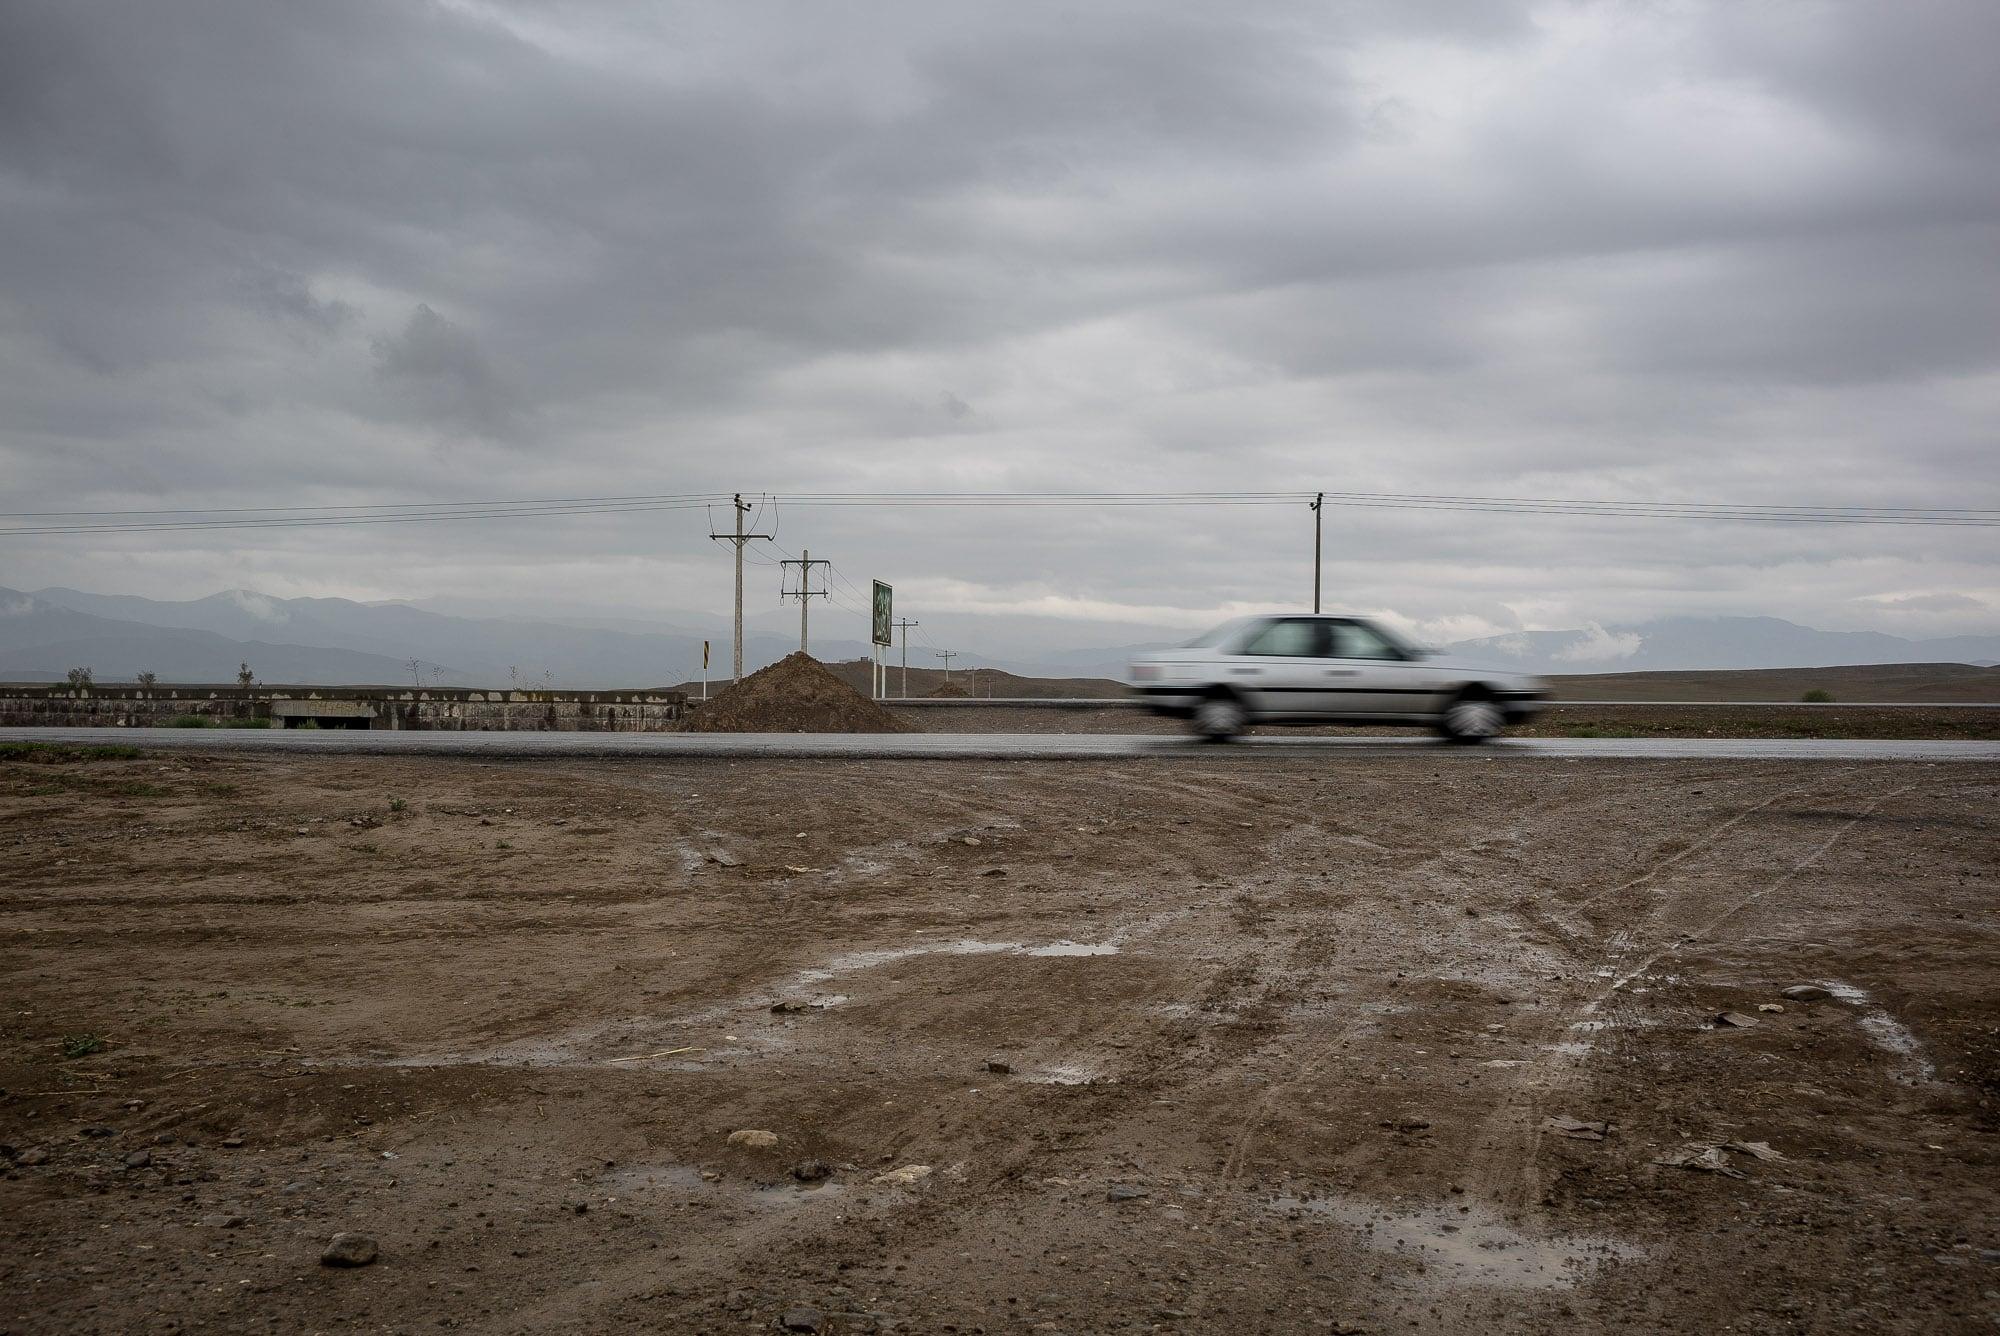 mud and traffic